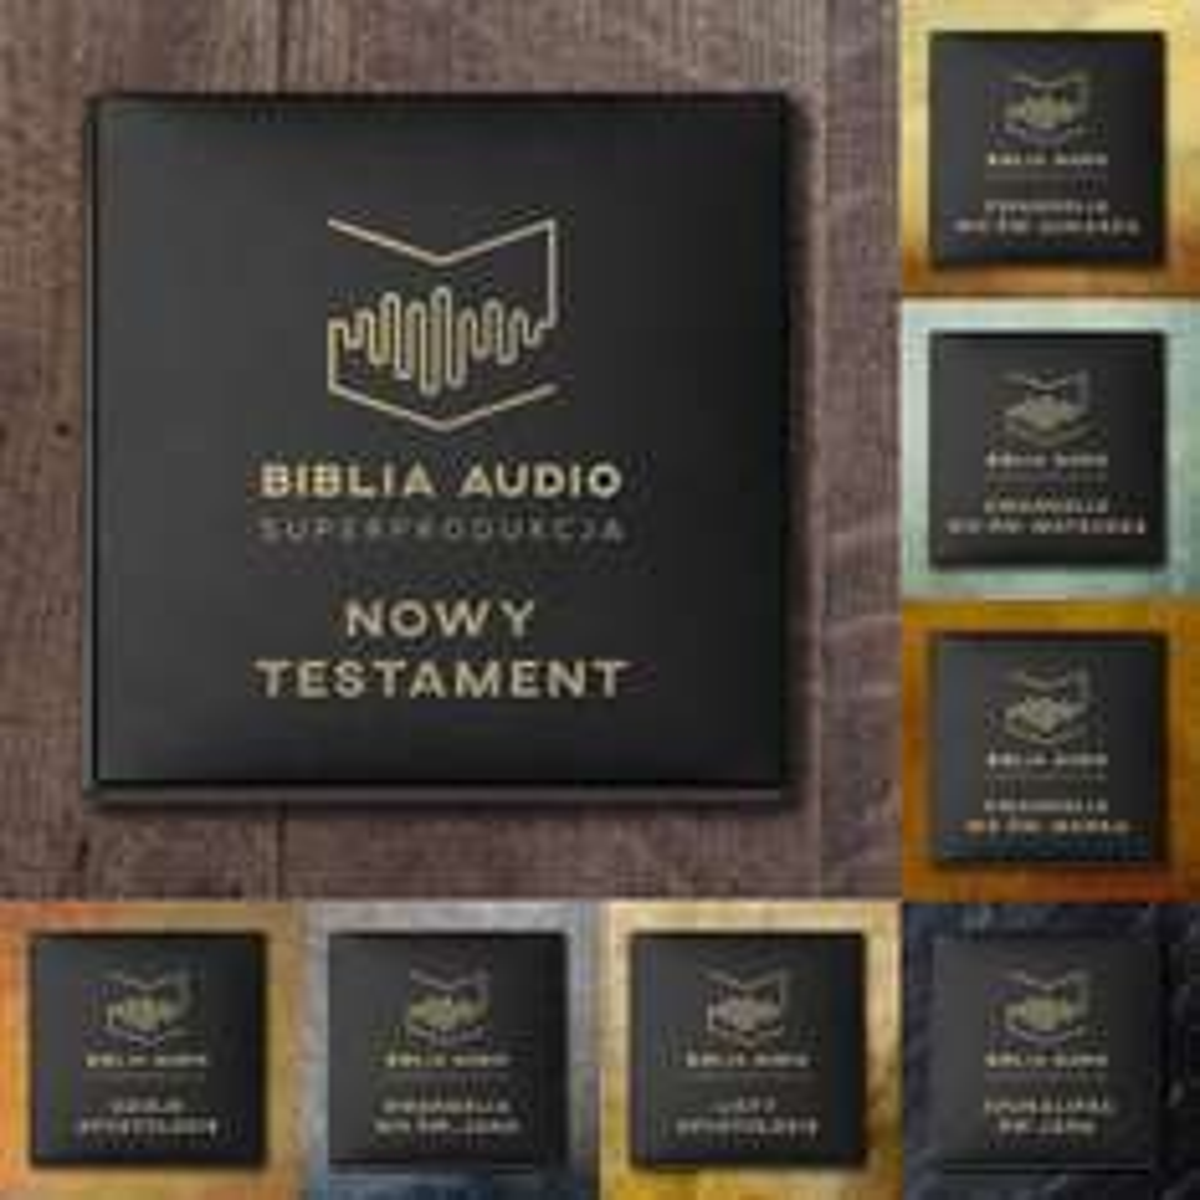 Biblia Audio - Superprodukcja za darmo